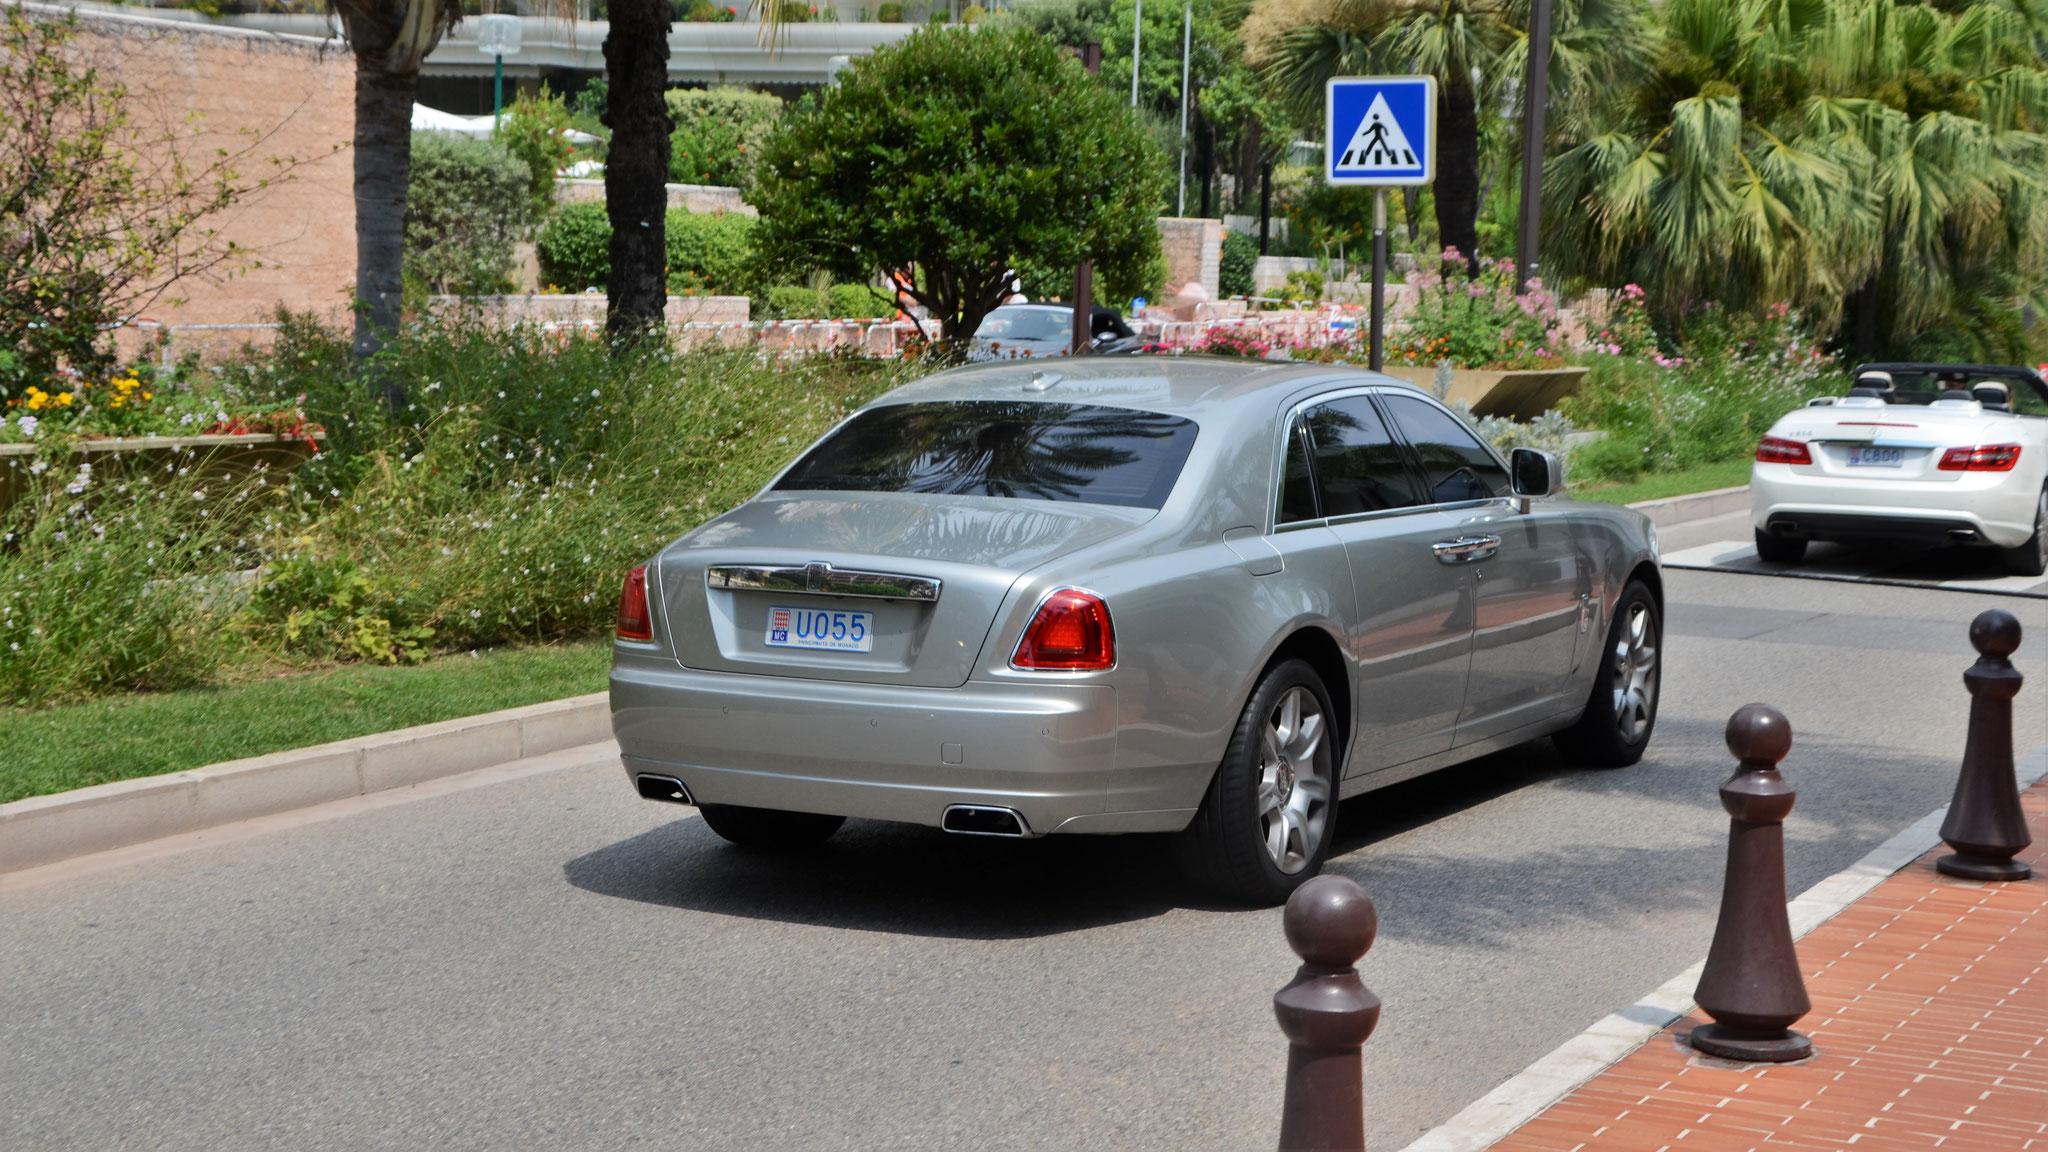 Rolls Royce Ghost - U055 (MC)